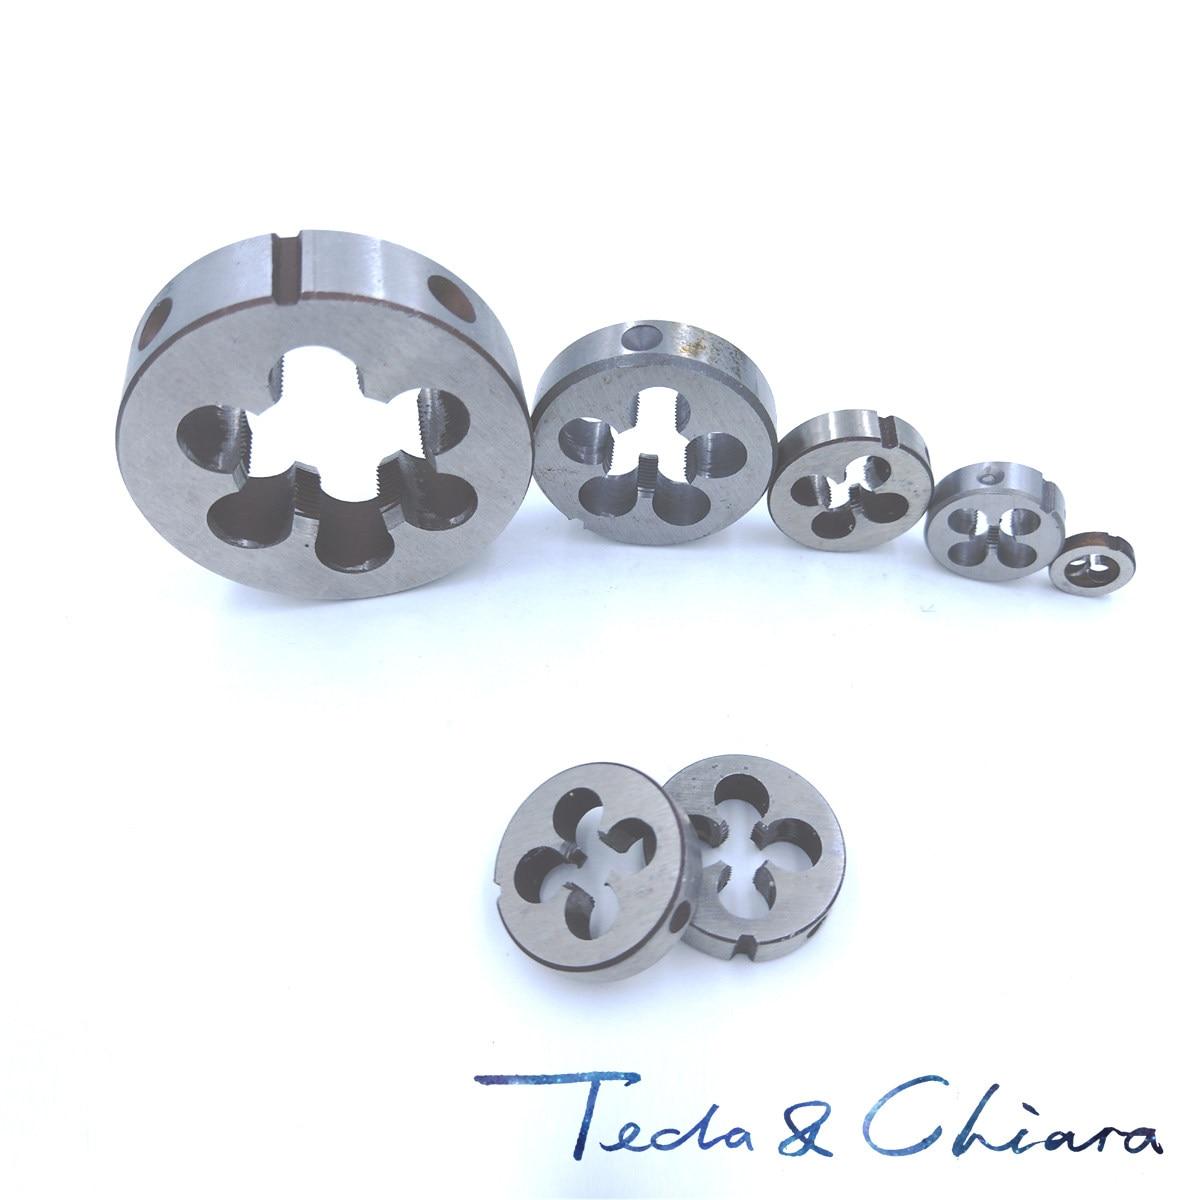 1pc HSS Machine M24 X 1.5mm Plug Tap and 1pc M24 X 1.5mm Die Threading Tool